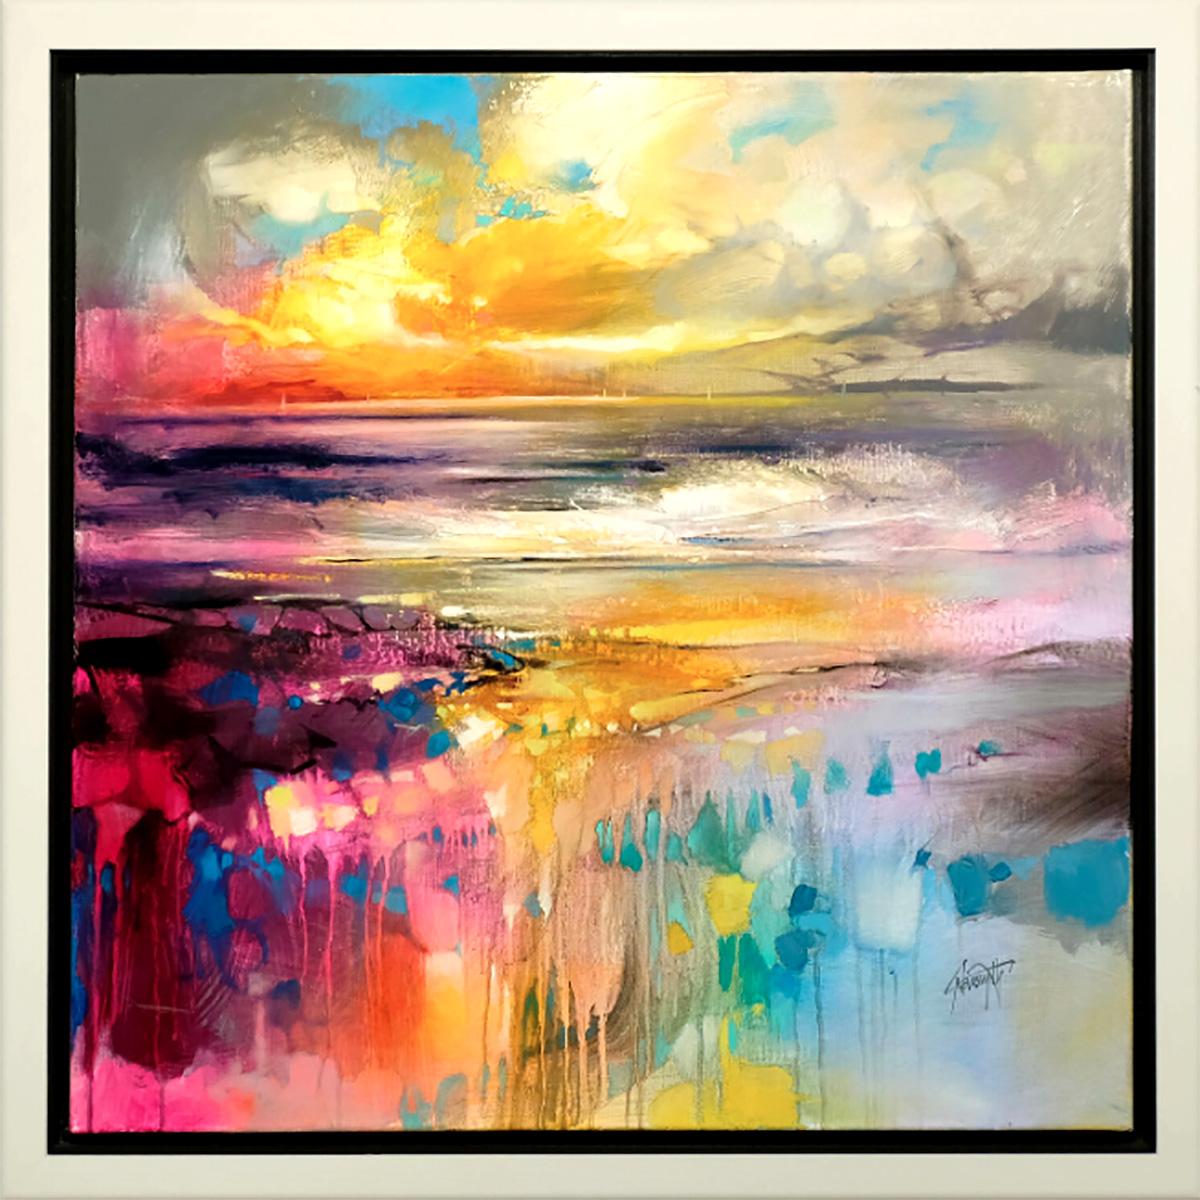 Scott Naismith - Liquid Reflections, oil and acrylic on linen